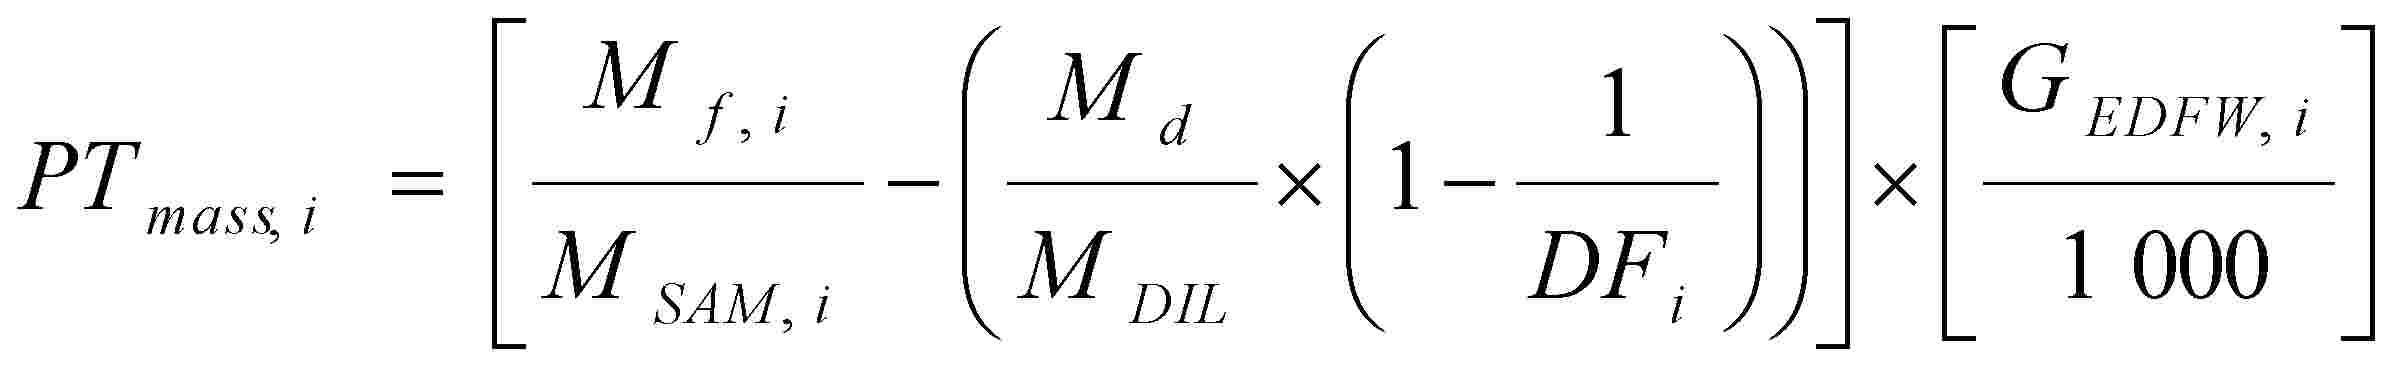 dating interval ligning bo aron jensen dating